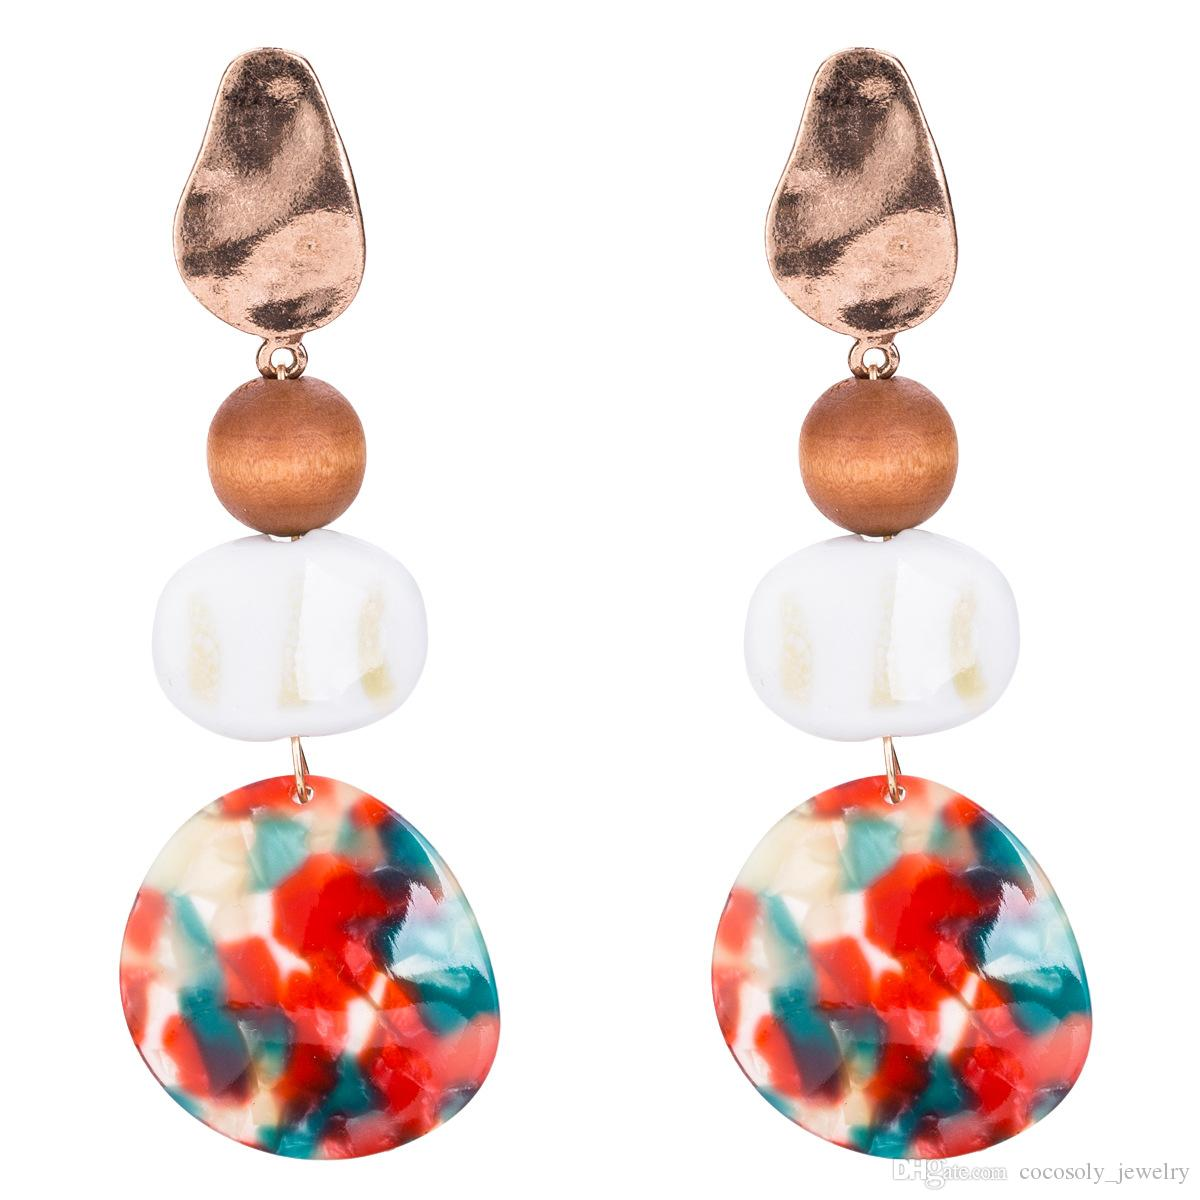 Fashion Jewelry New Ethnic Multi-layered stone Long Tassel Earrings Bohemian Acetate plate Drop Dangle Earrings For Women Accessories